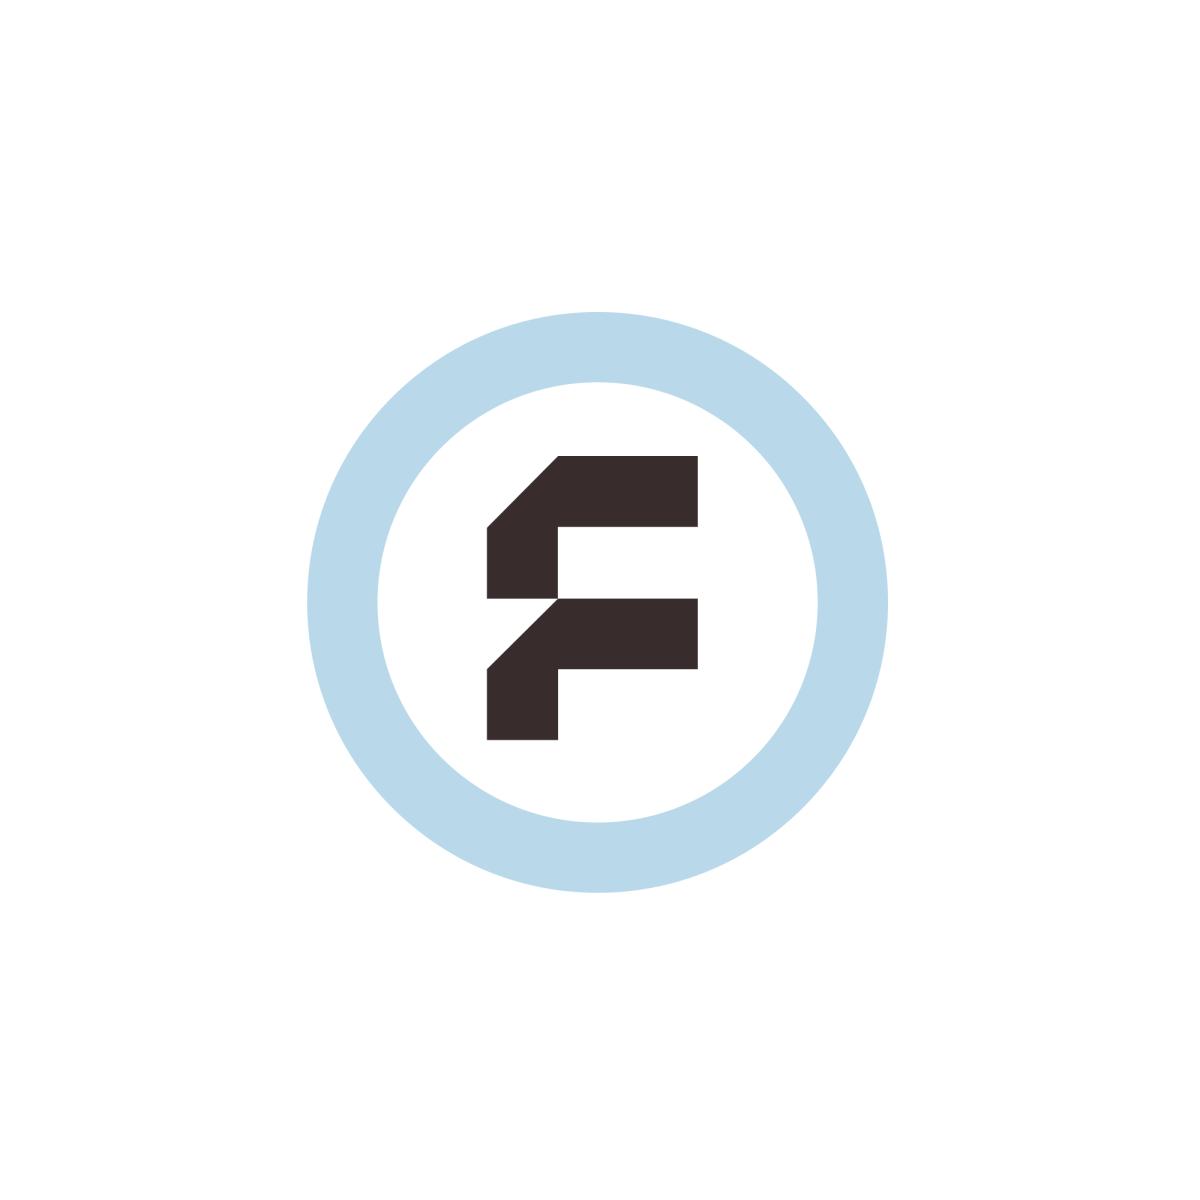 Fyber Old Logo Germany Letter Logo Single Letter Logo Letter F